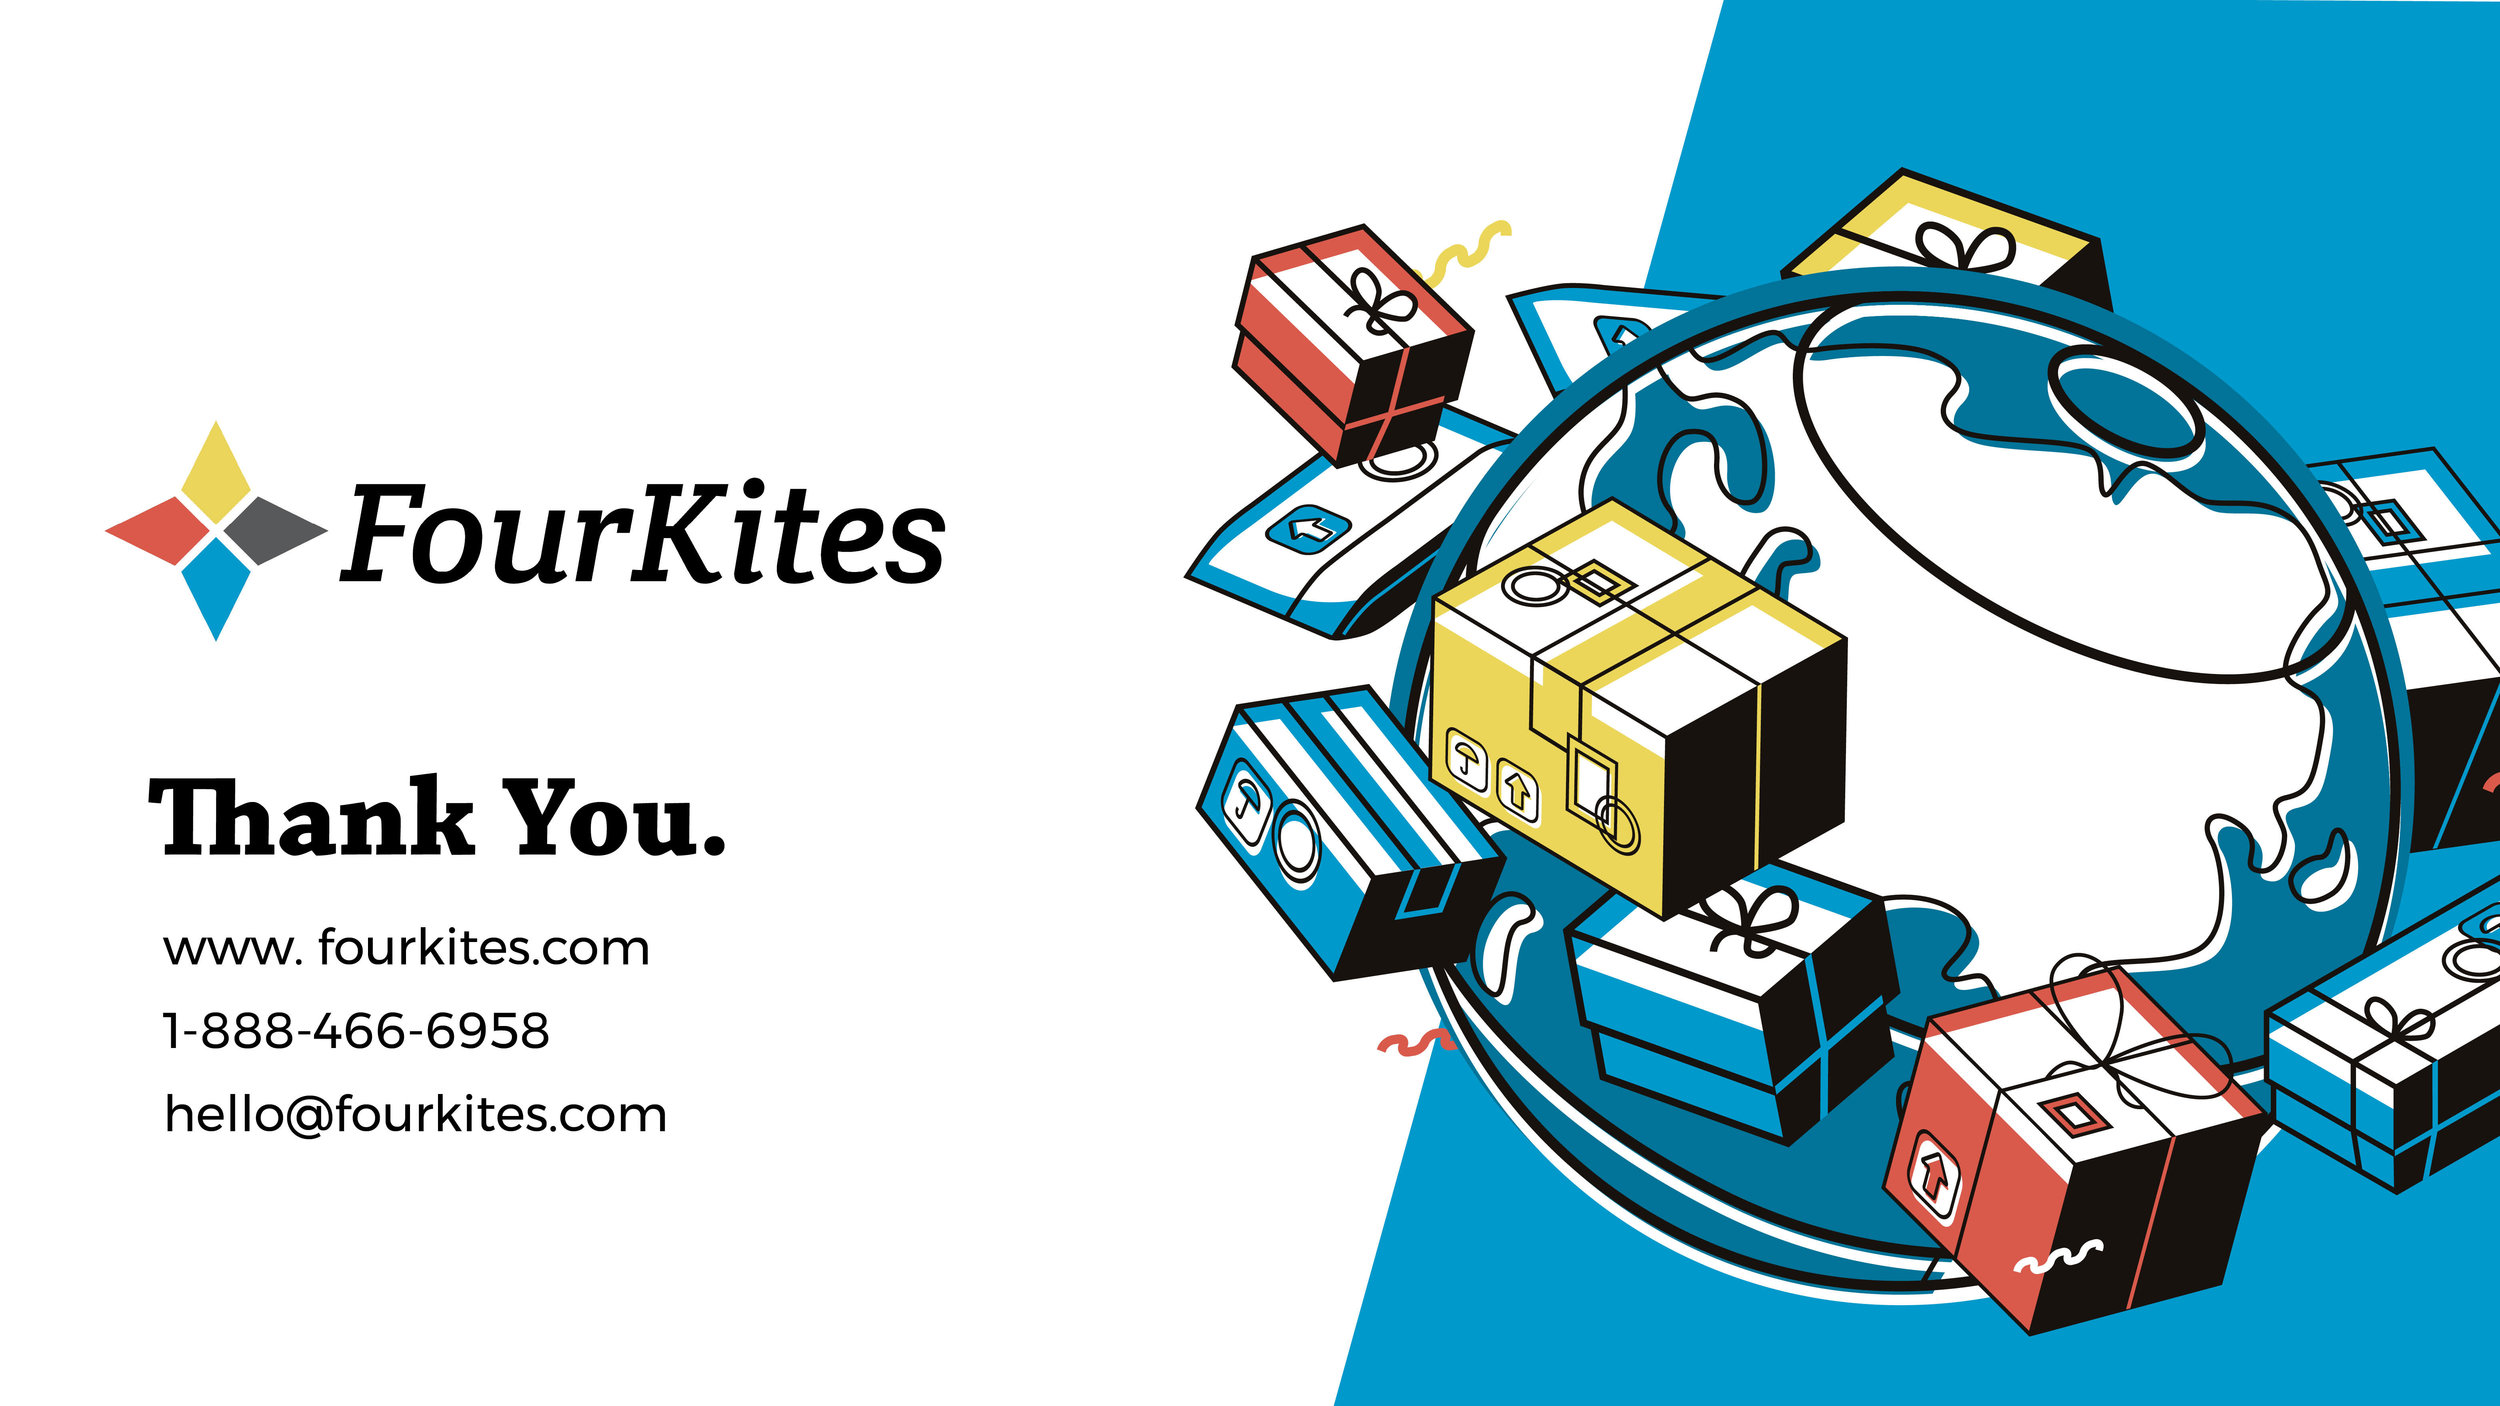 FourKites_deck_v117.jpg